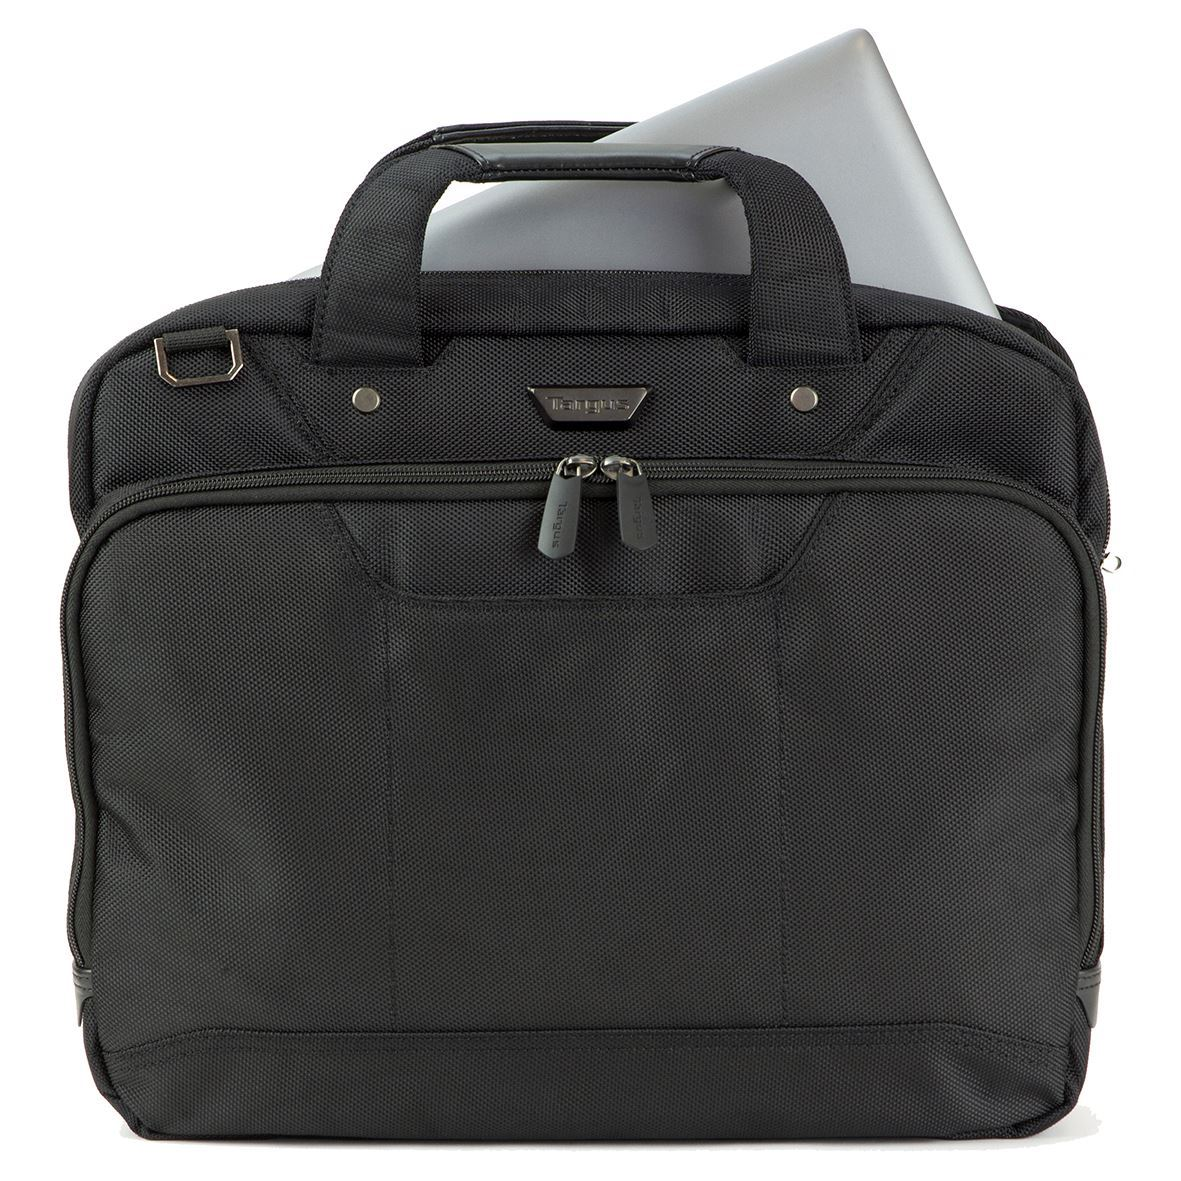 corporate traveller mallette ultrafine pour ordinateur portable 14 noir. Black Bedroom Furniture Sets. Home Design Ideas